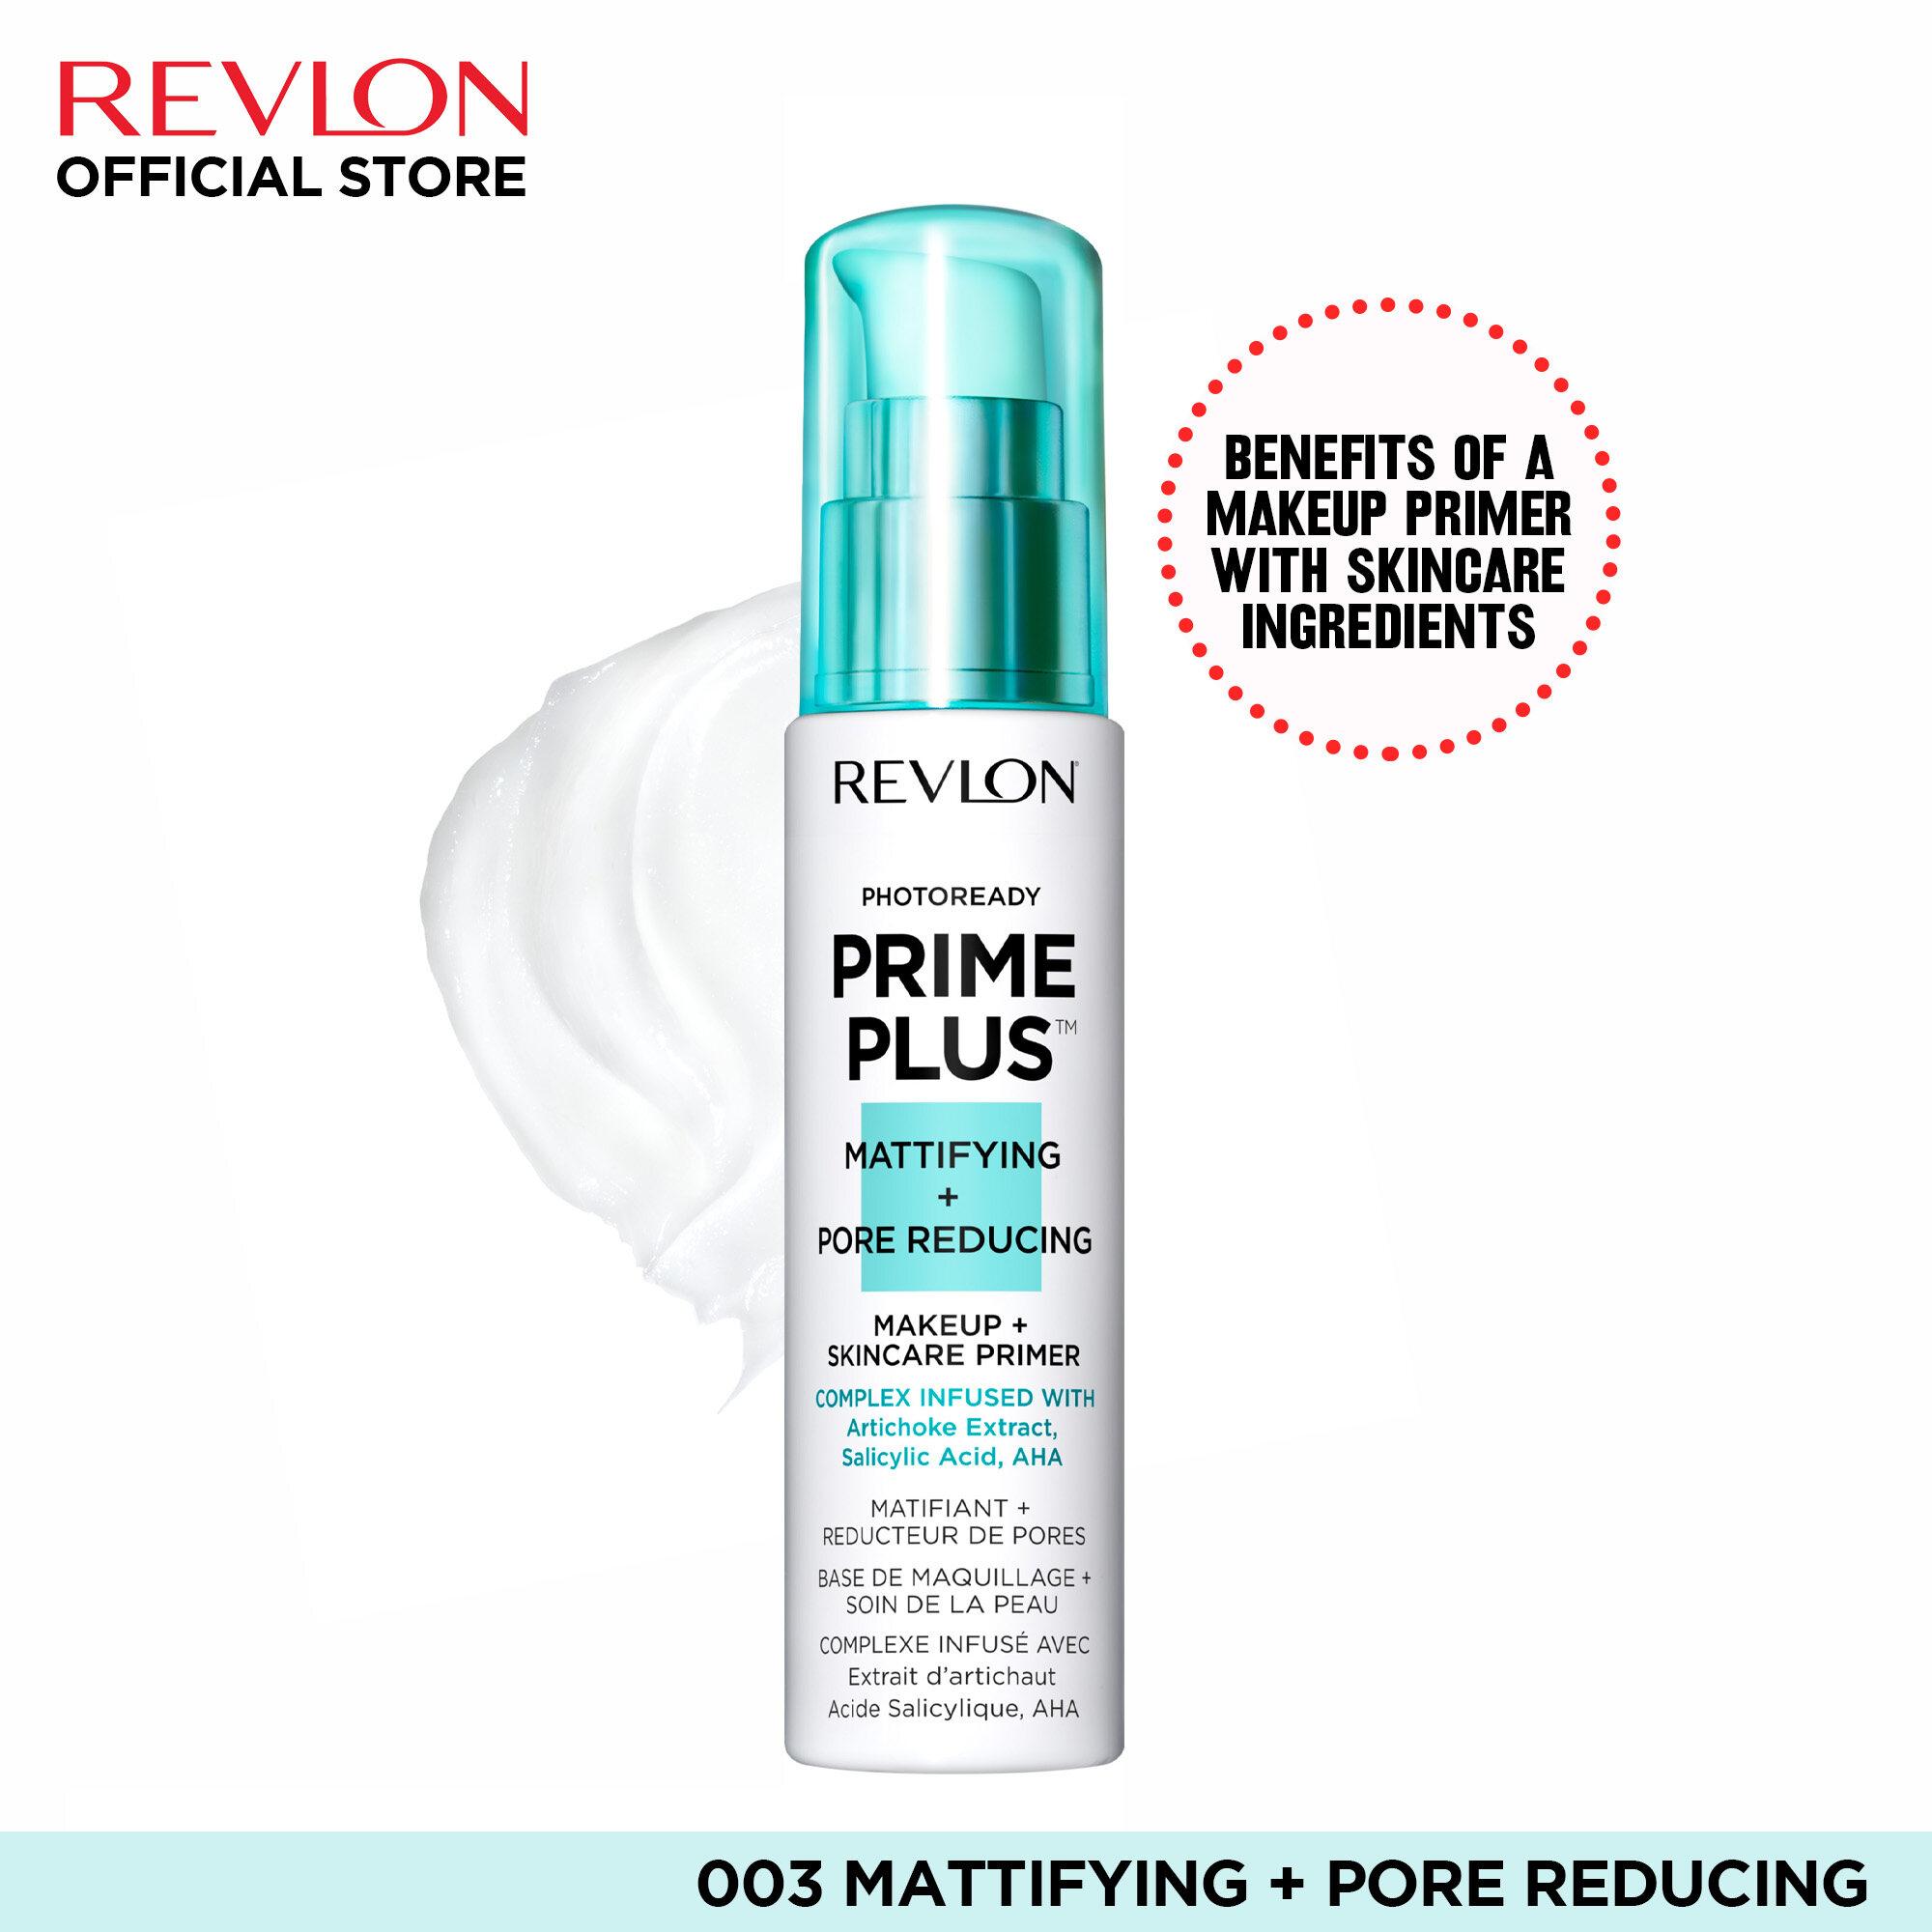 Revlon PhotoReady Prime Plus Makeup and SkinCare Primers -003 Mattifying and Pore Reducing